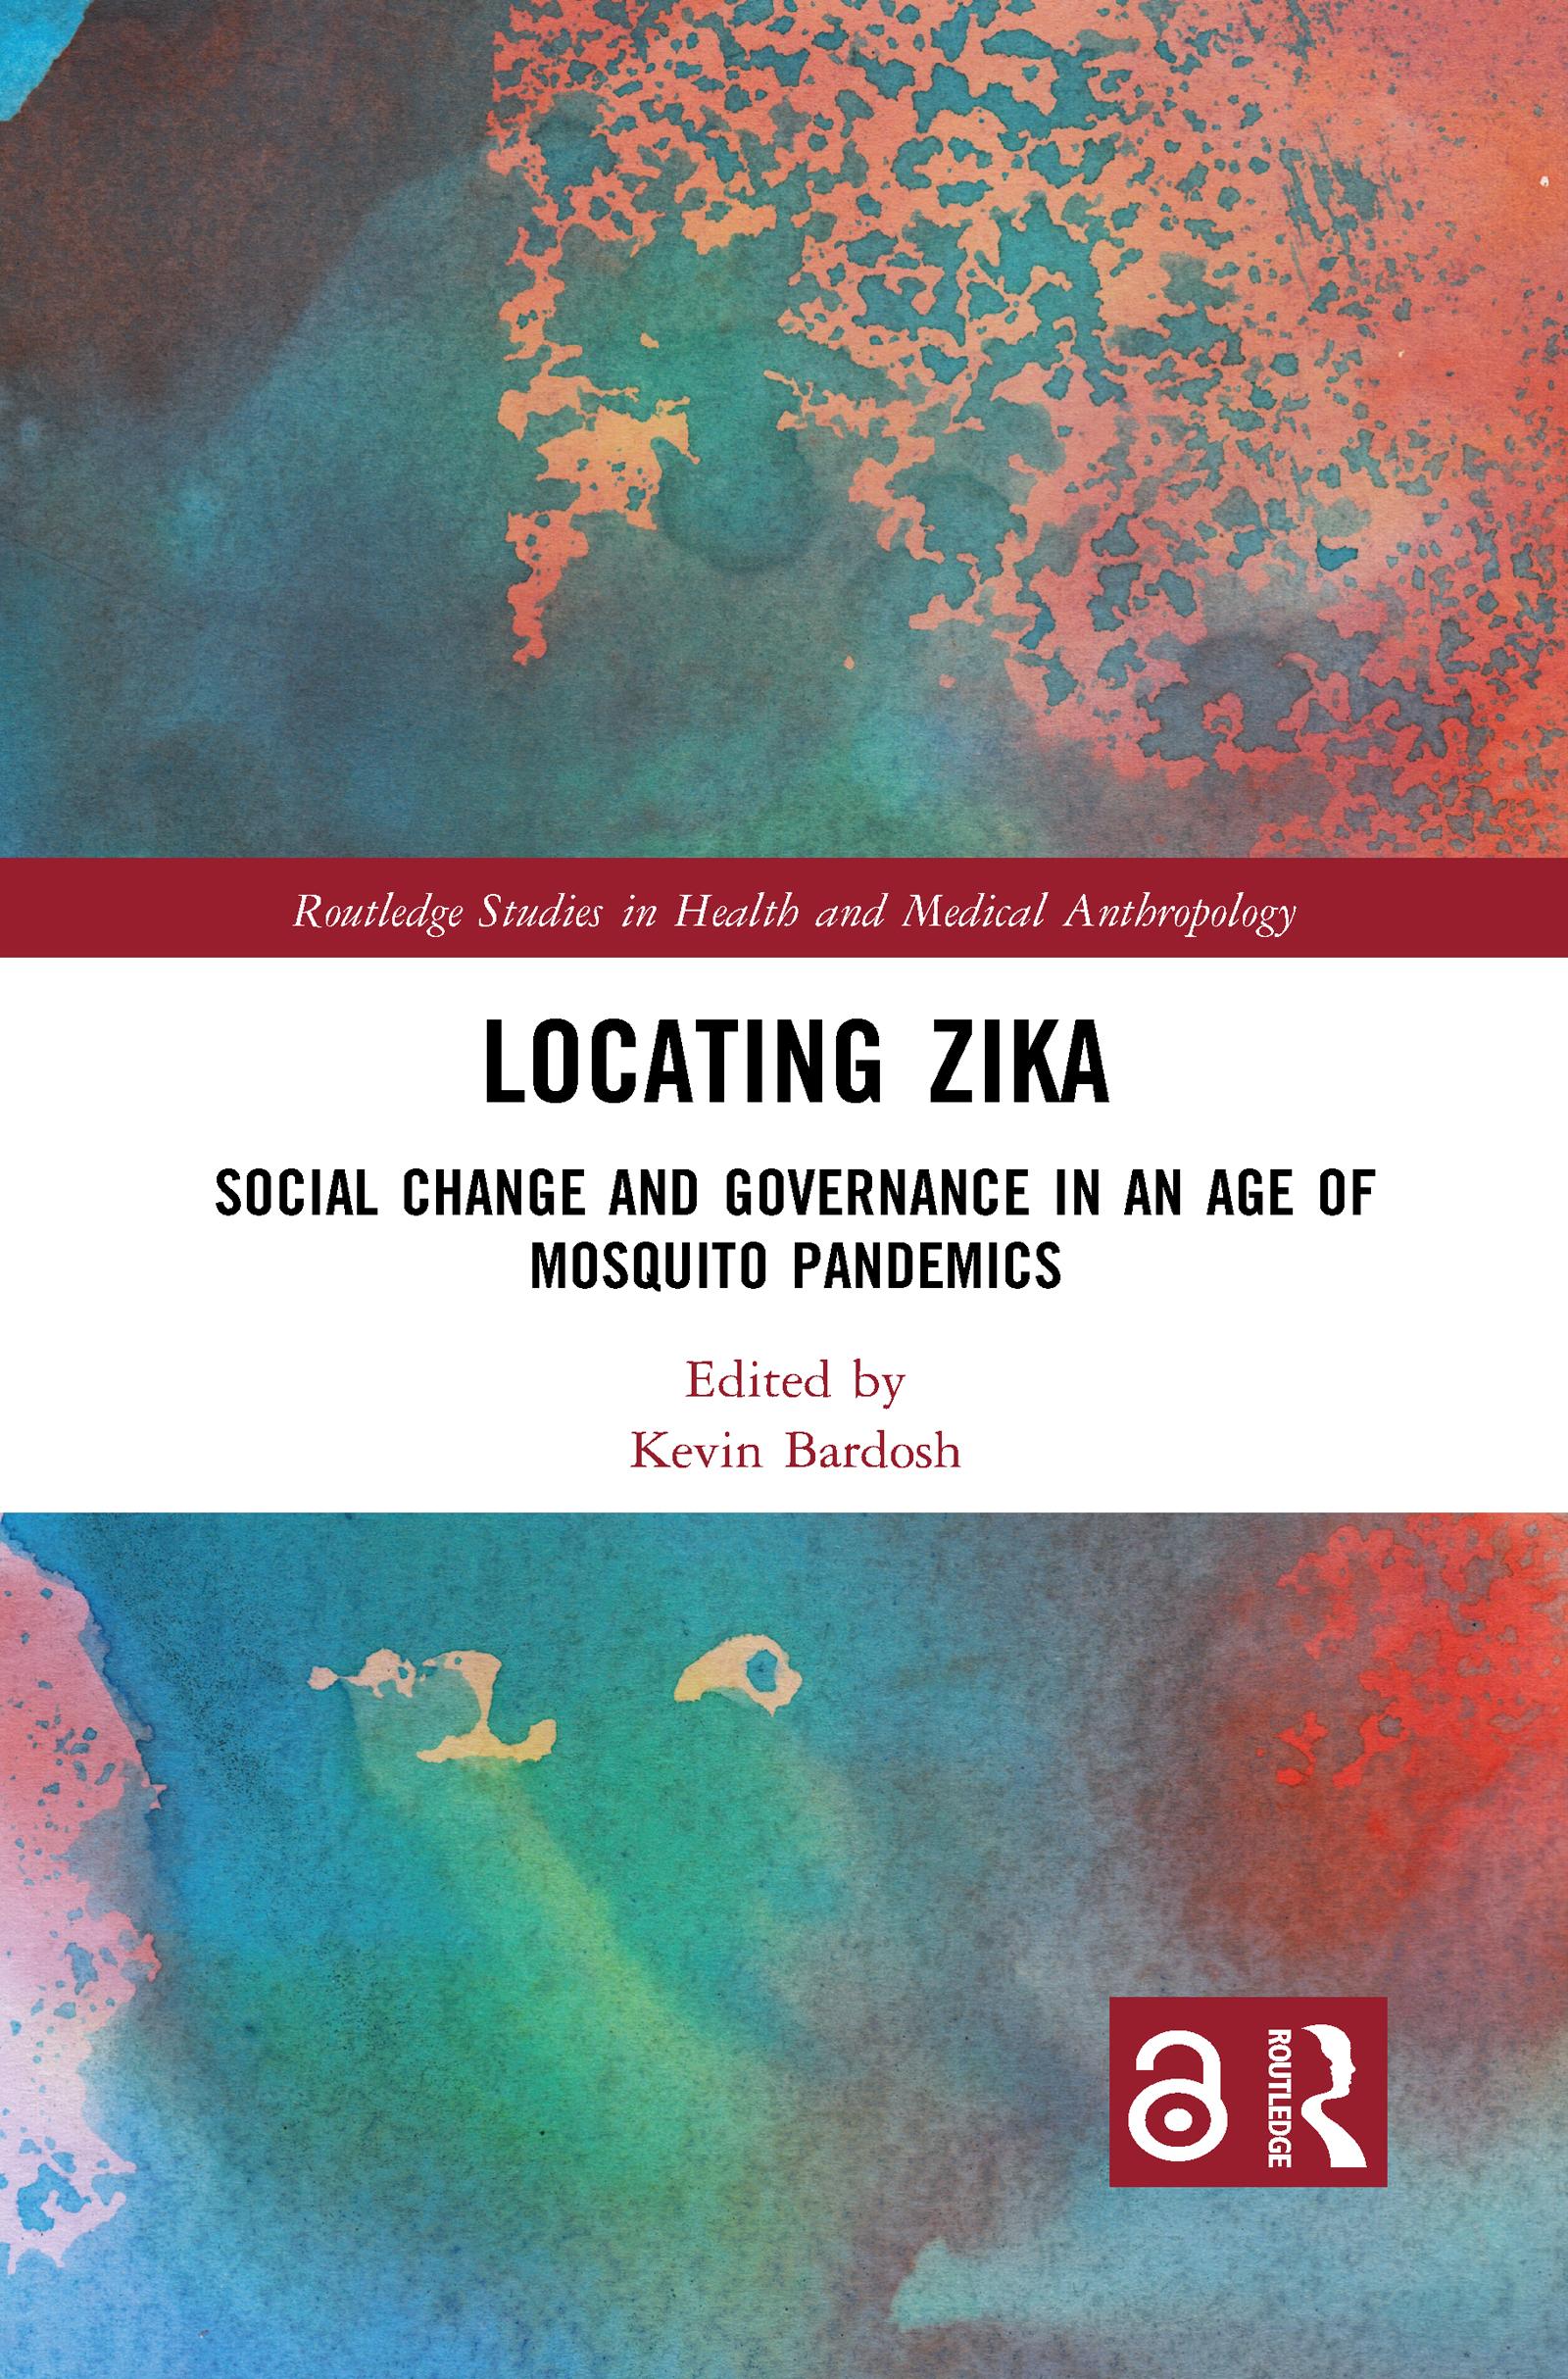 Locating Zika